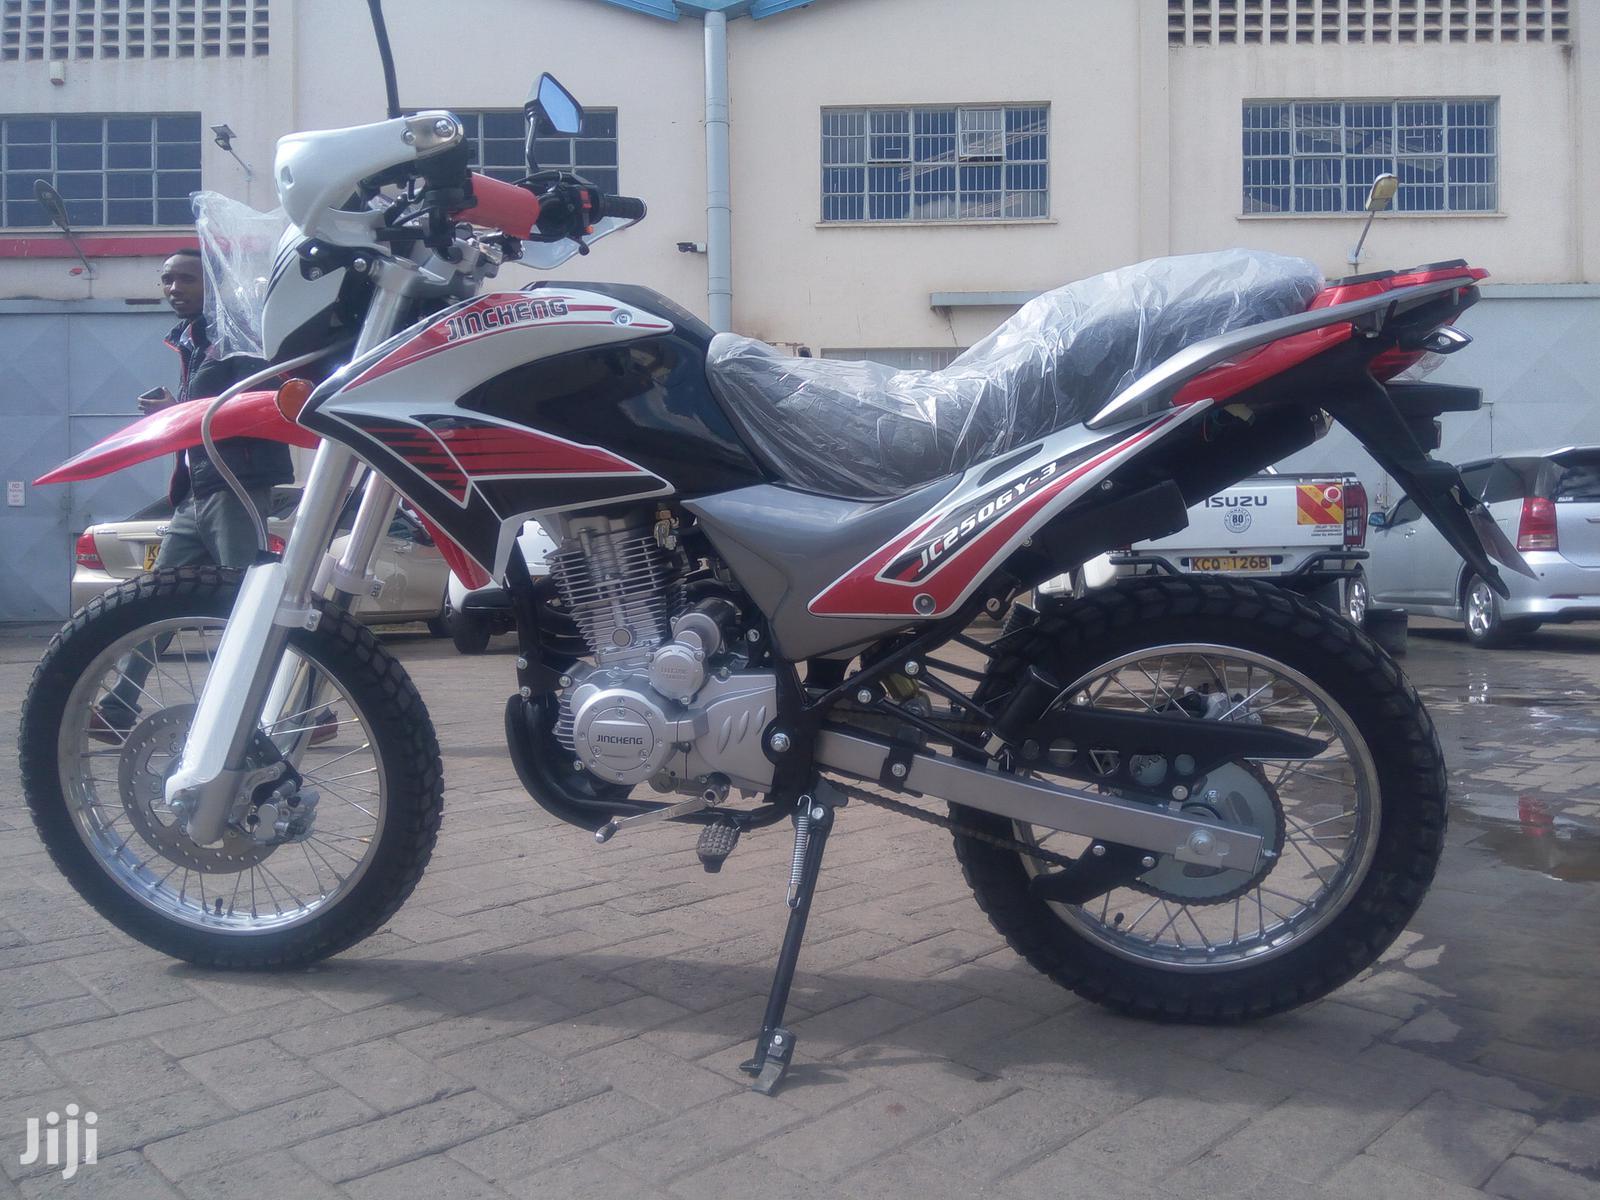 New Jincheng 2019 Red   Motorcycles & Scooters for sale in Landimawe, Nairobi, Kenya